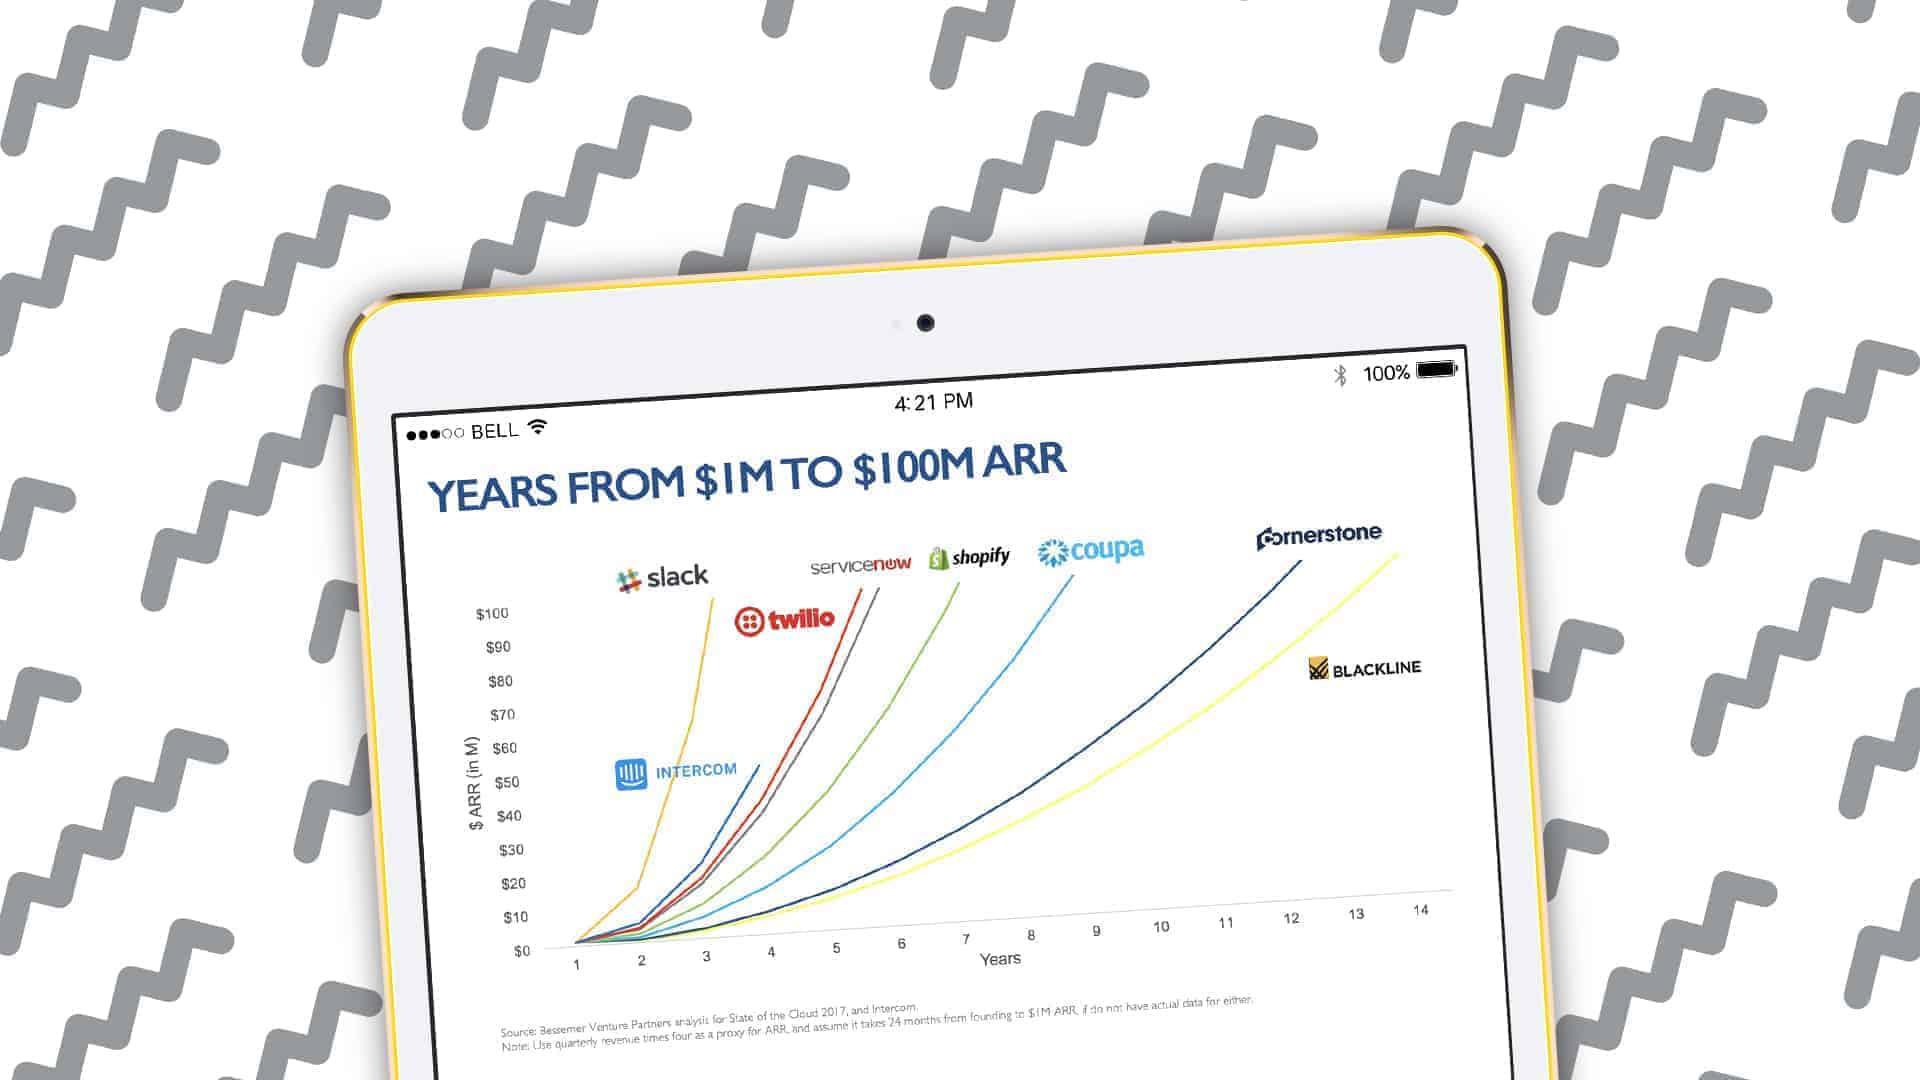 How Intercom Built a $50MM ARR Empire Using Strategic Content Marketing and SEO